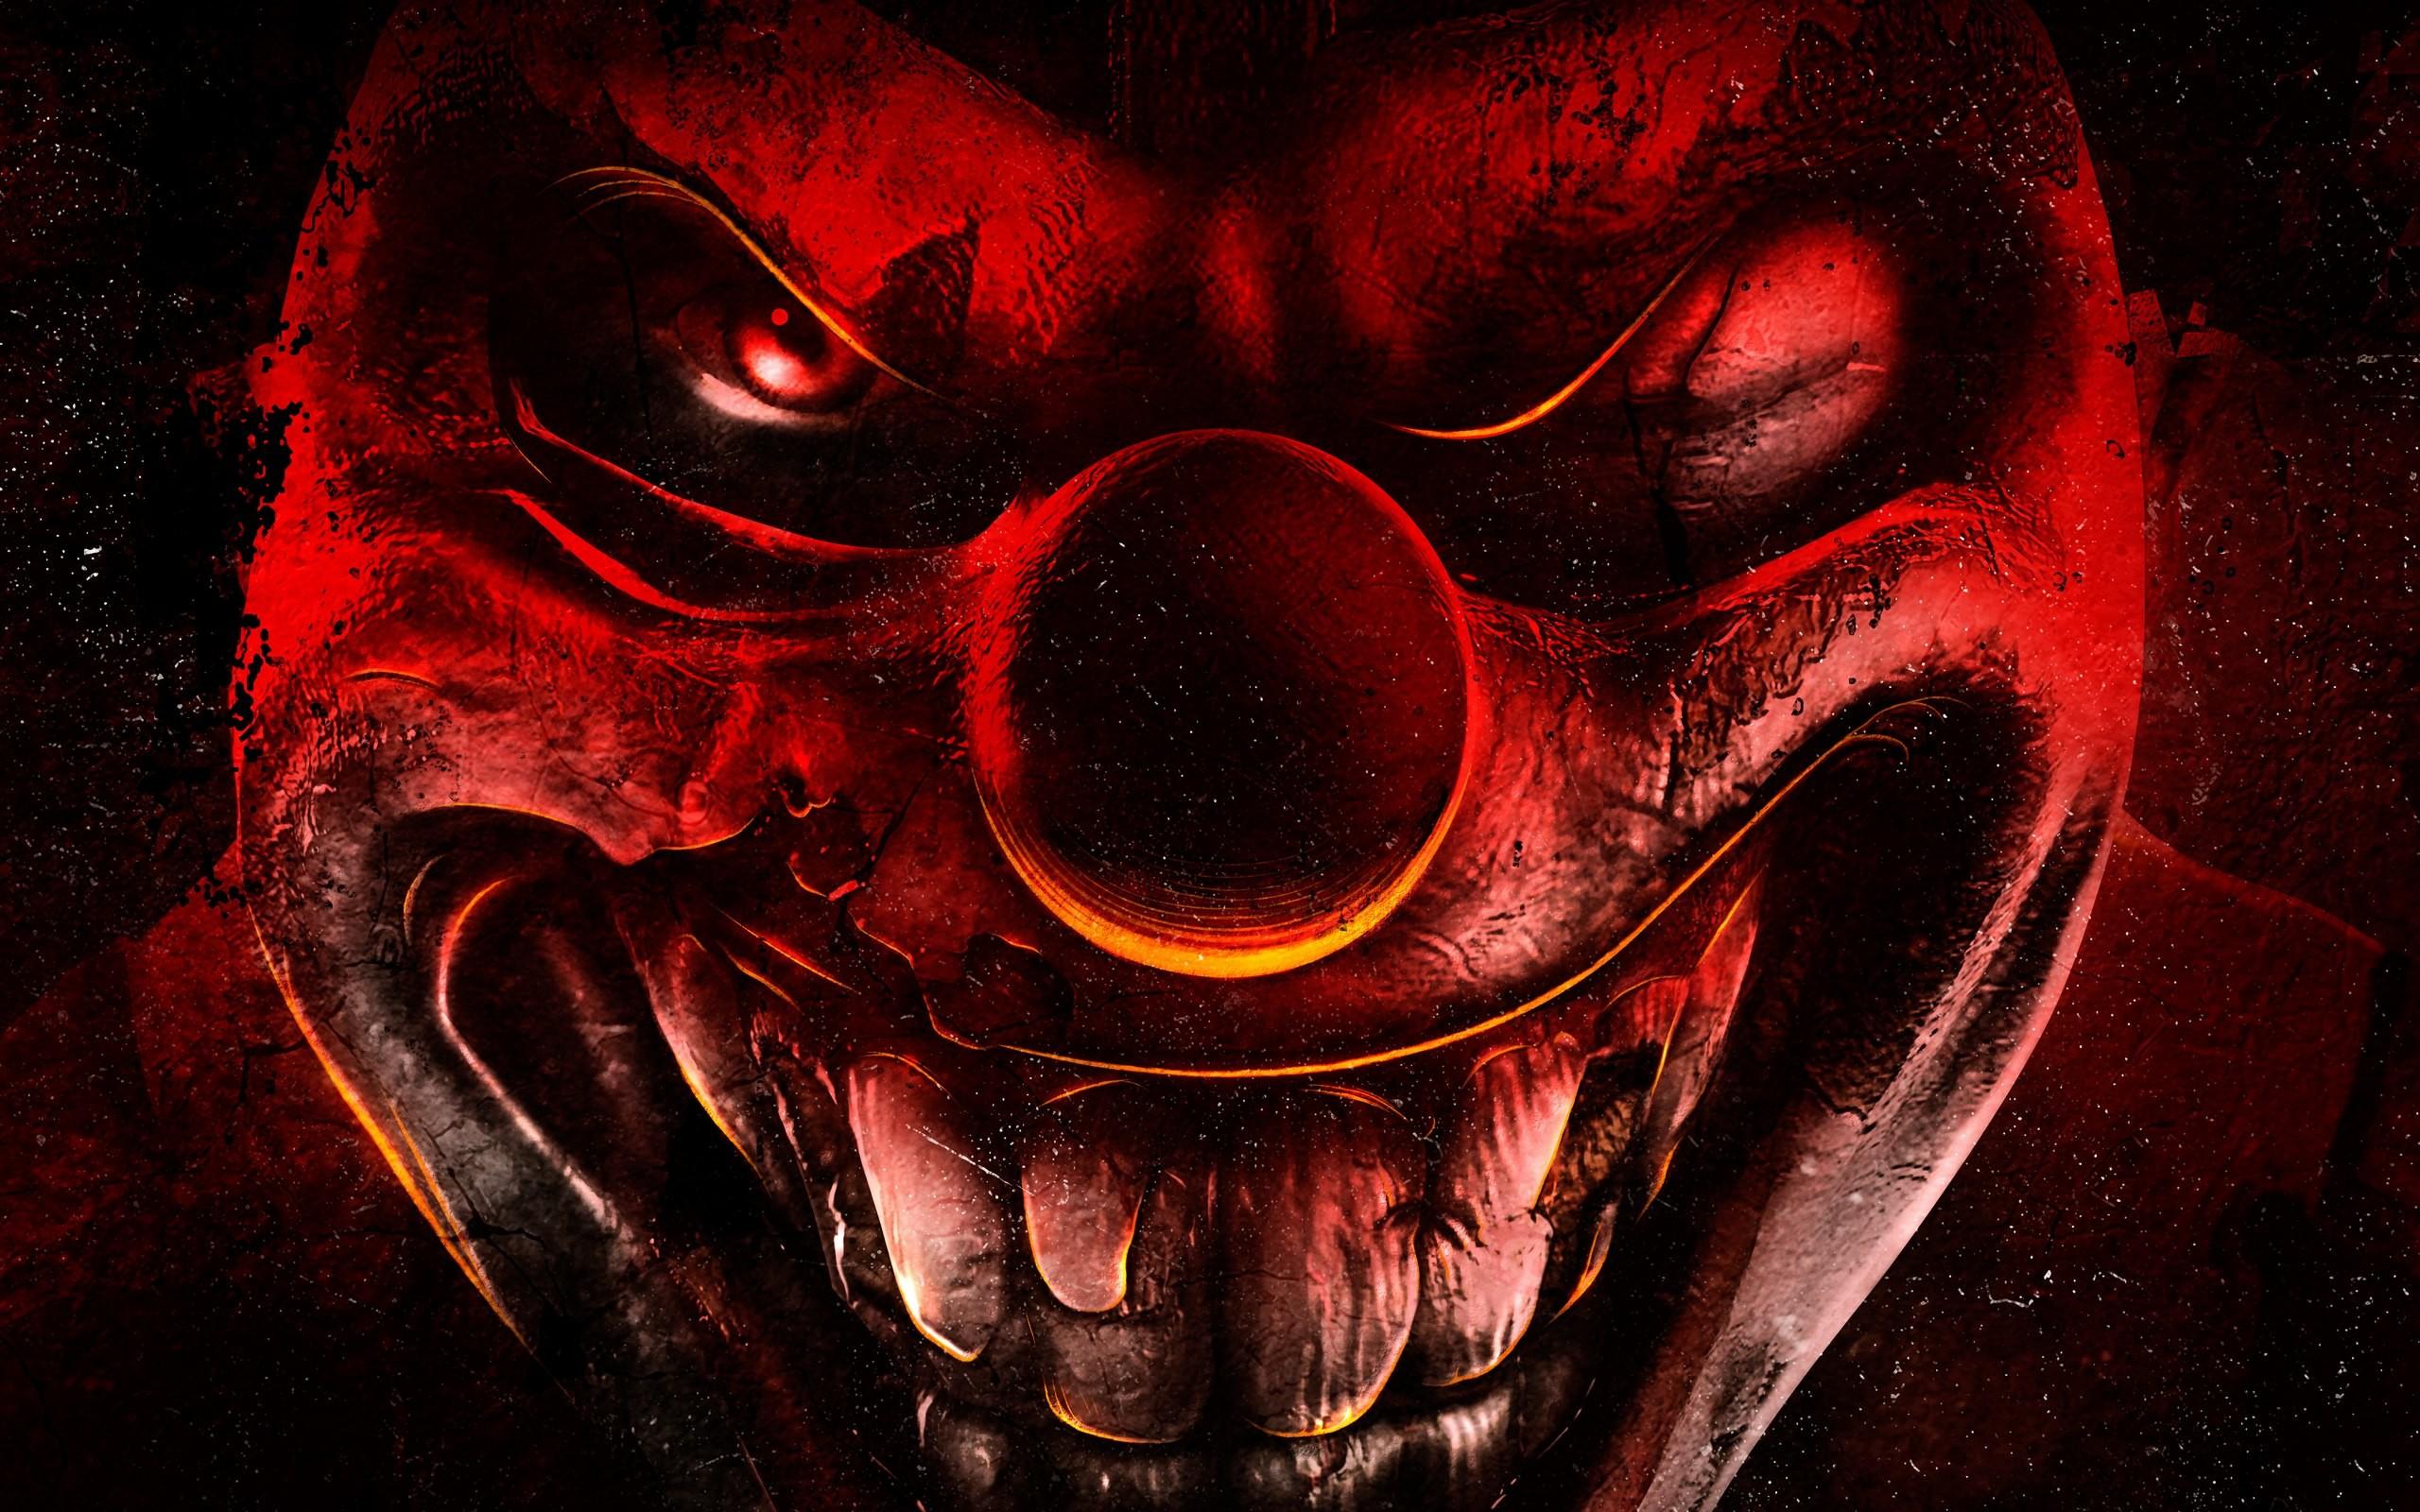 Scary Clown Happy Halloween 13 Source · Scary Clown HD Wallpaper  WallpaperSafari